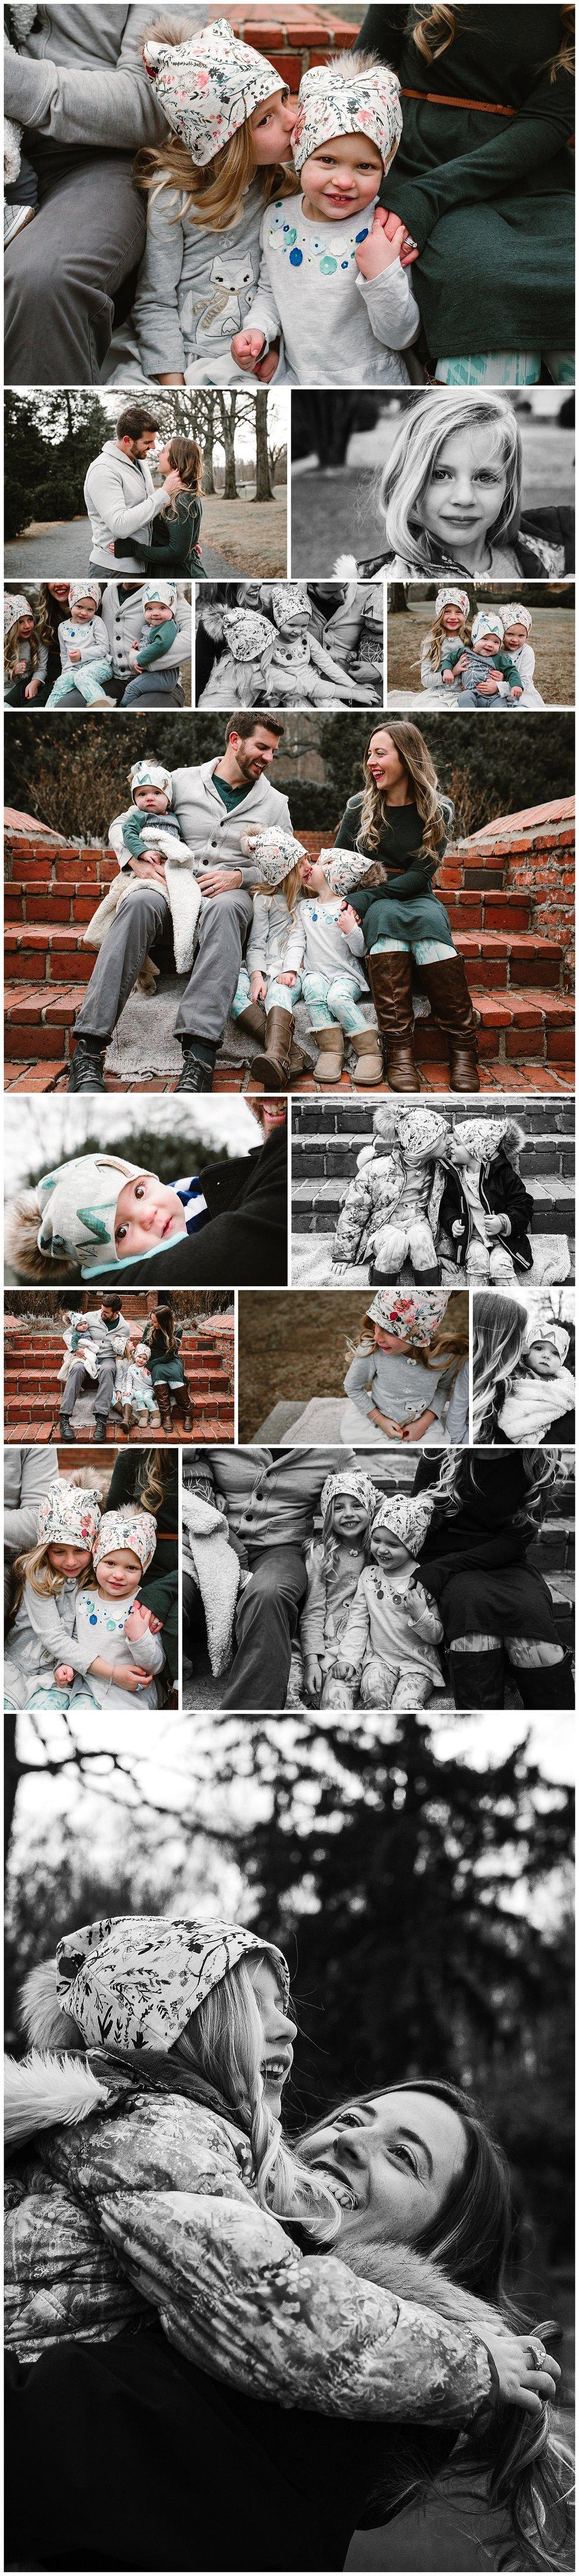 Leesburg Virginia family photography